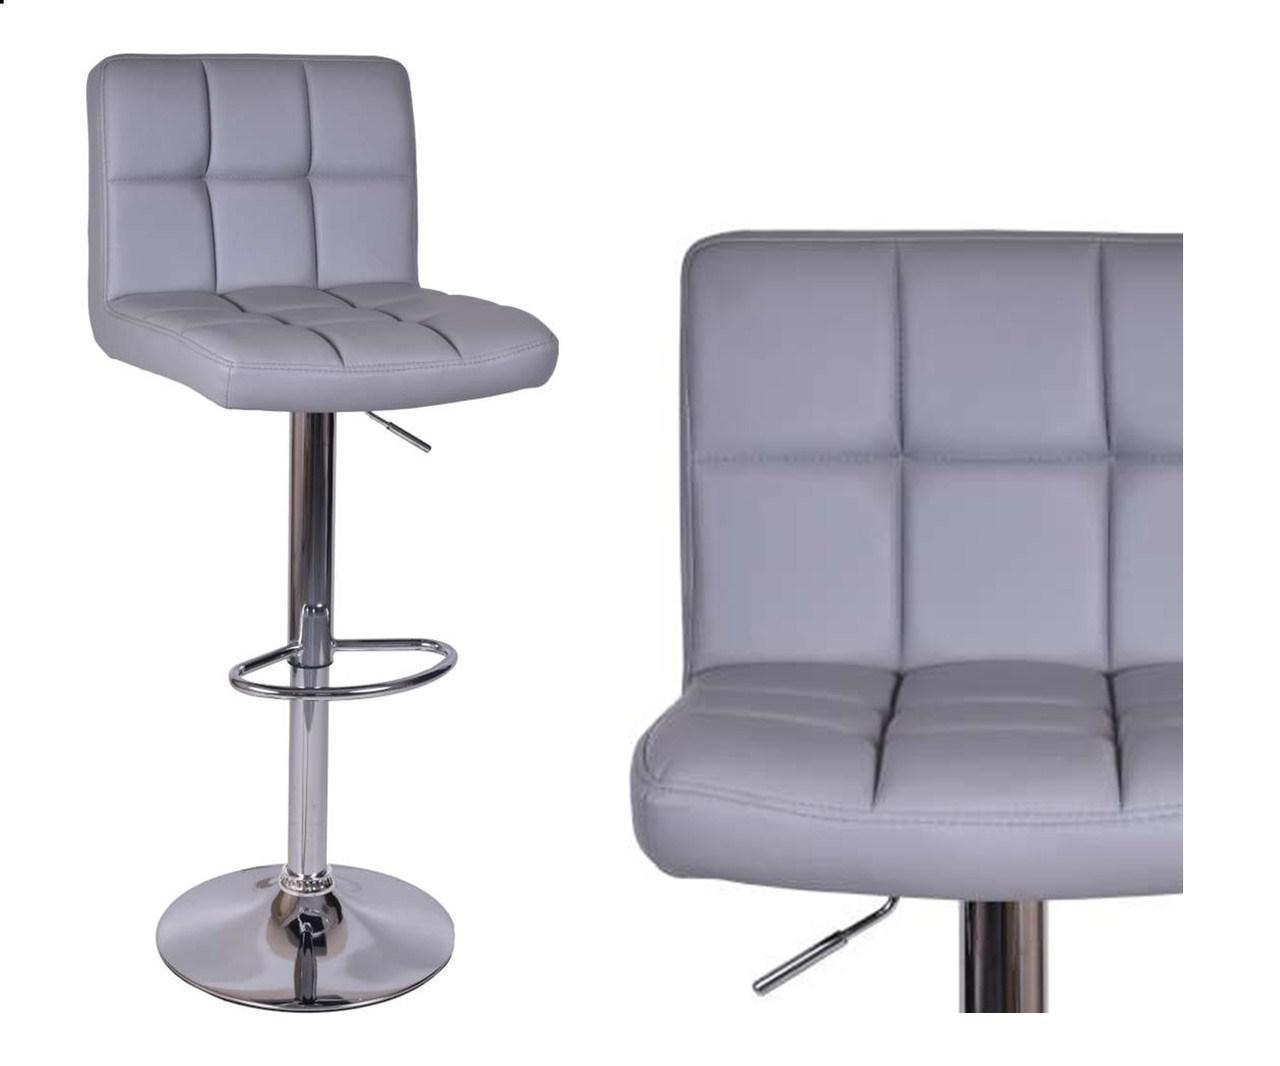 Барный стул табурет барний стілець кресло для кухни Hoker серый